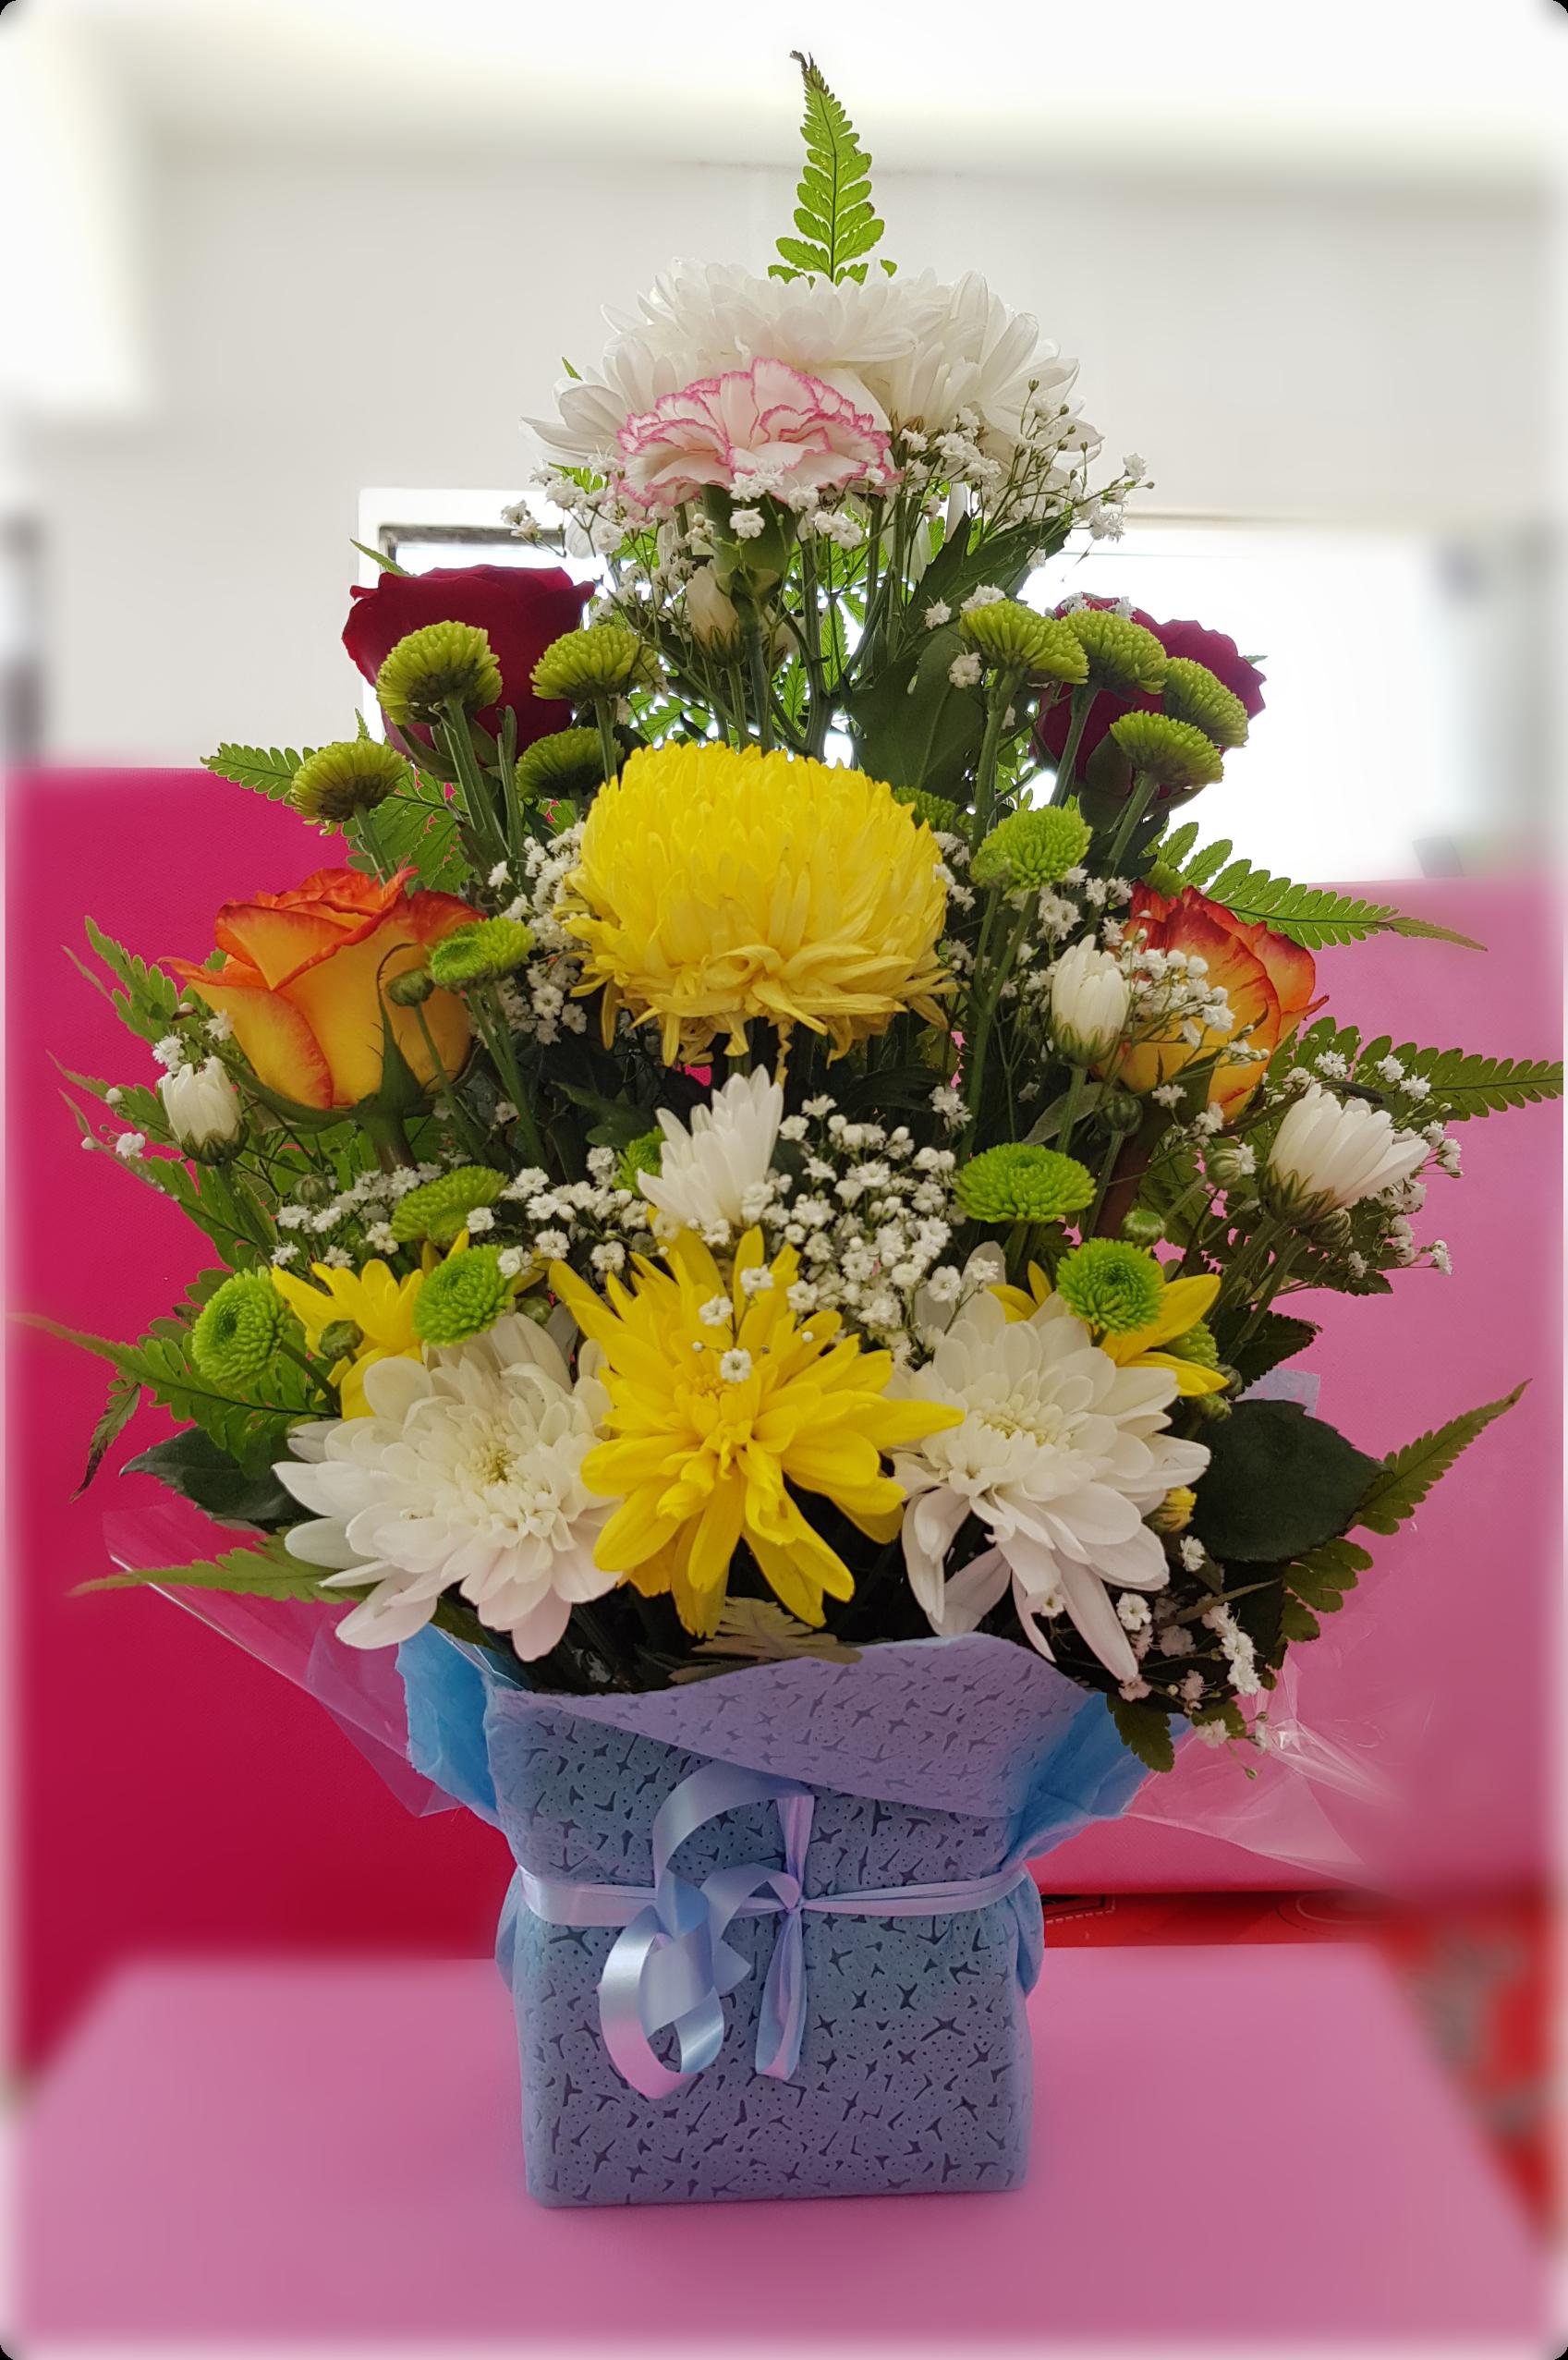 onlineflowerdelivery, mixedflower,roses,gift,present,mixedarrangement